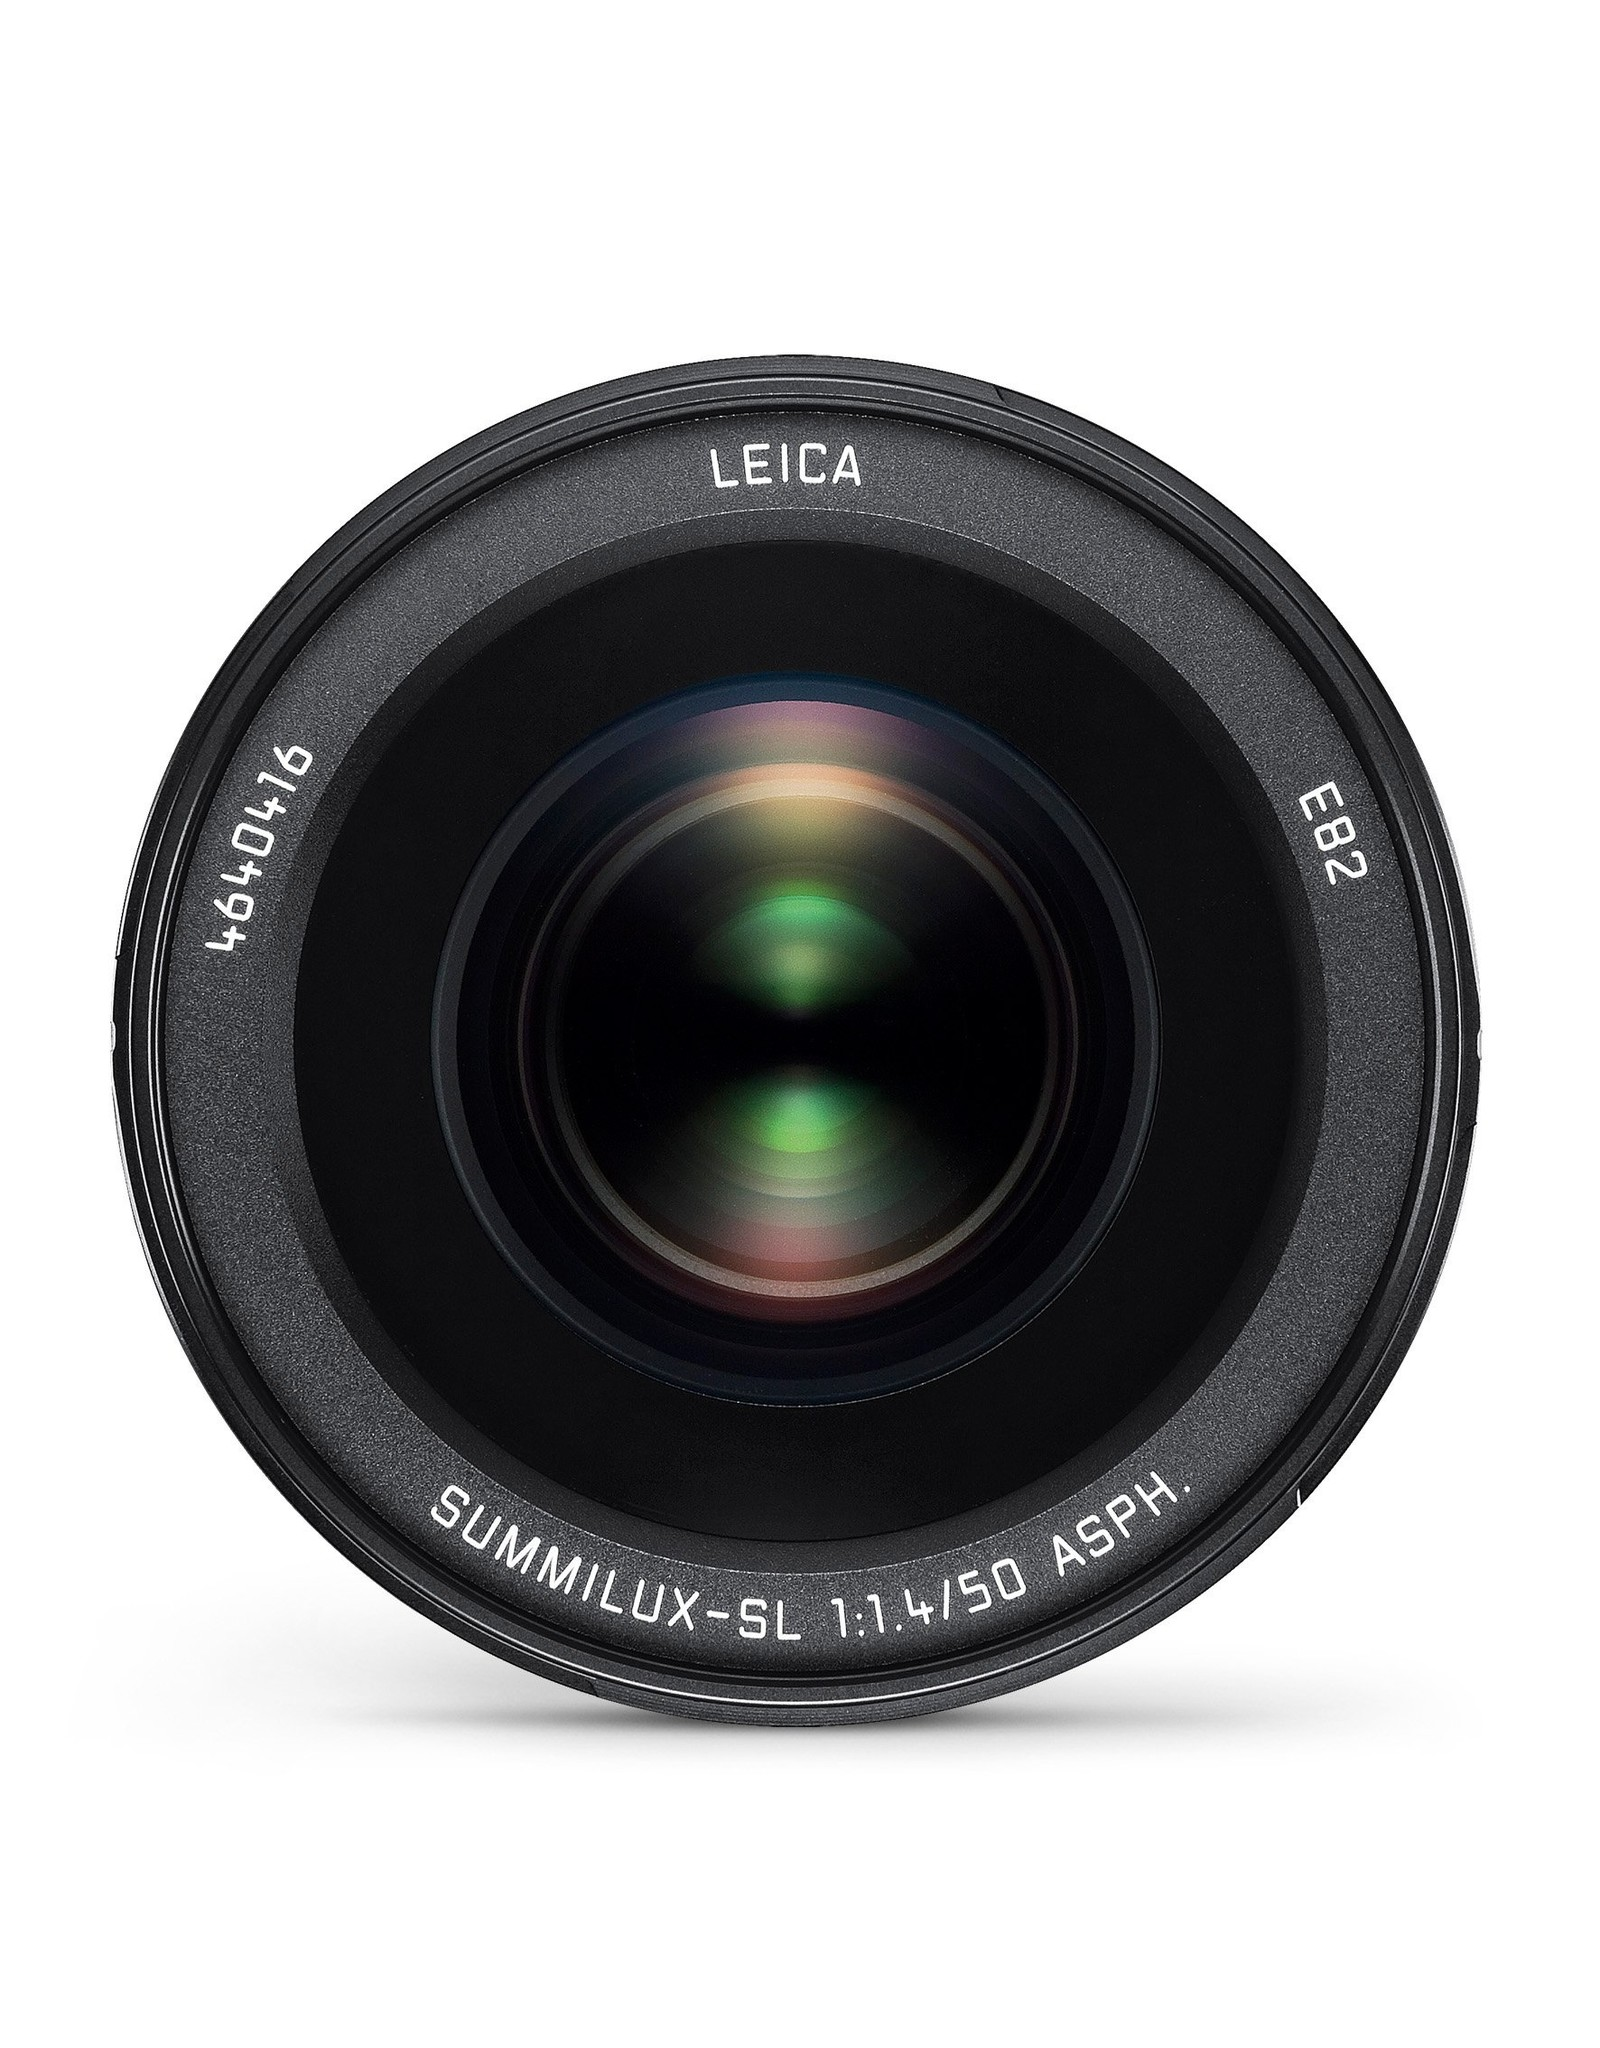 Leica Leica 50mm f1.4 Summilux-SL ASPH Black   111-80